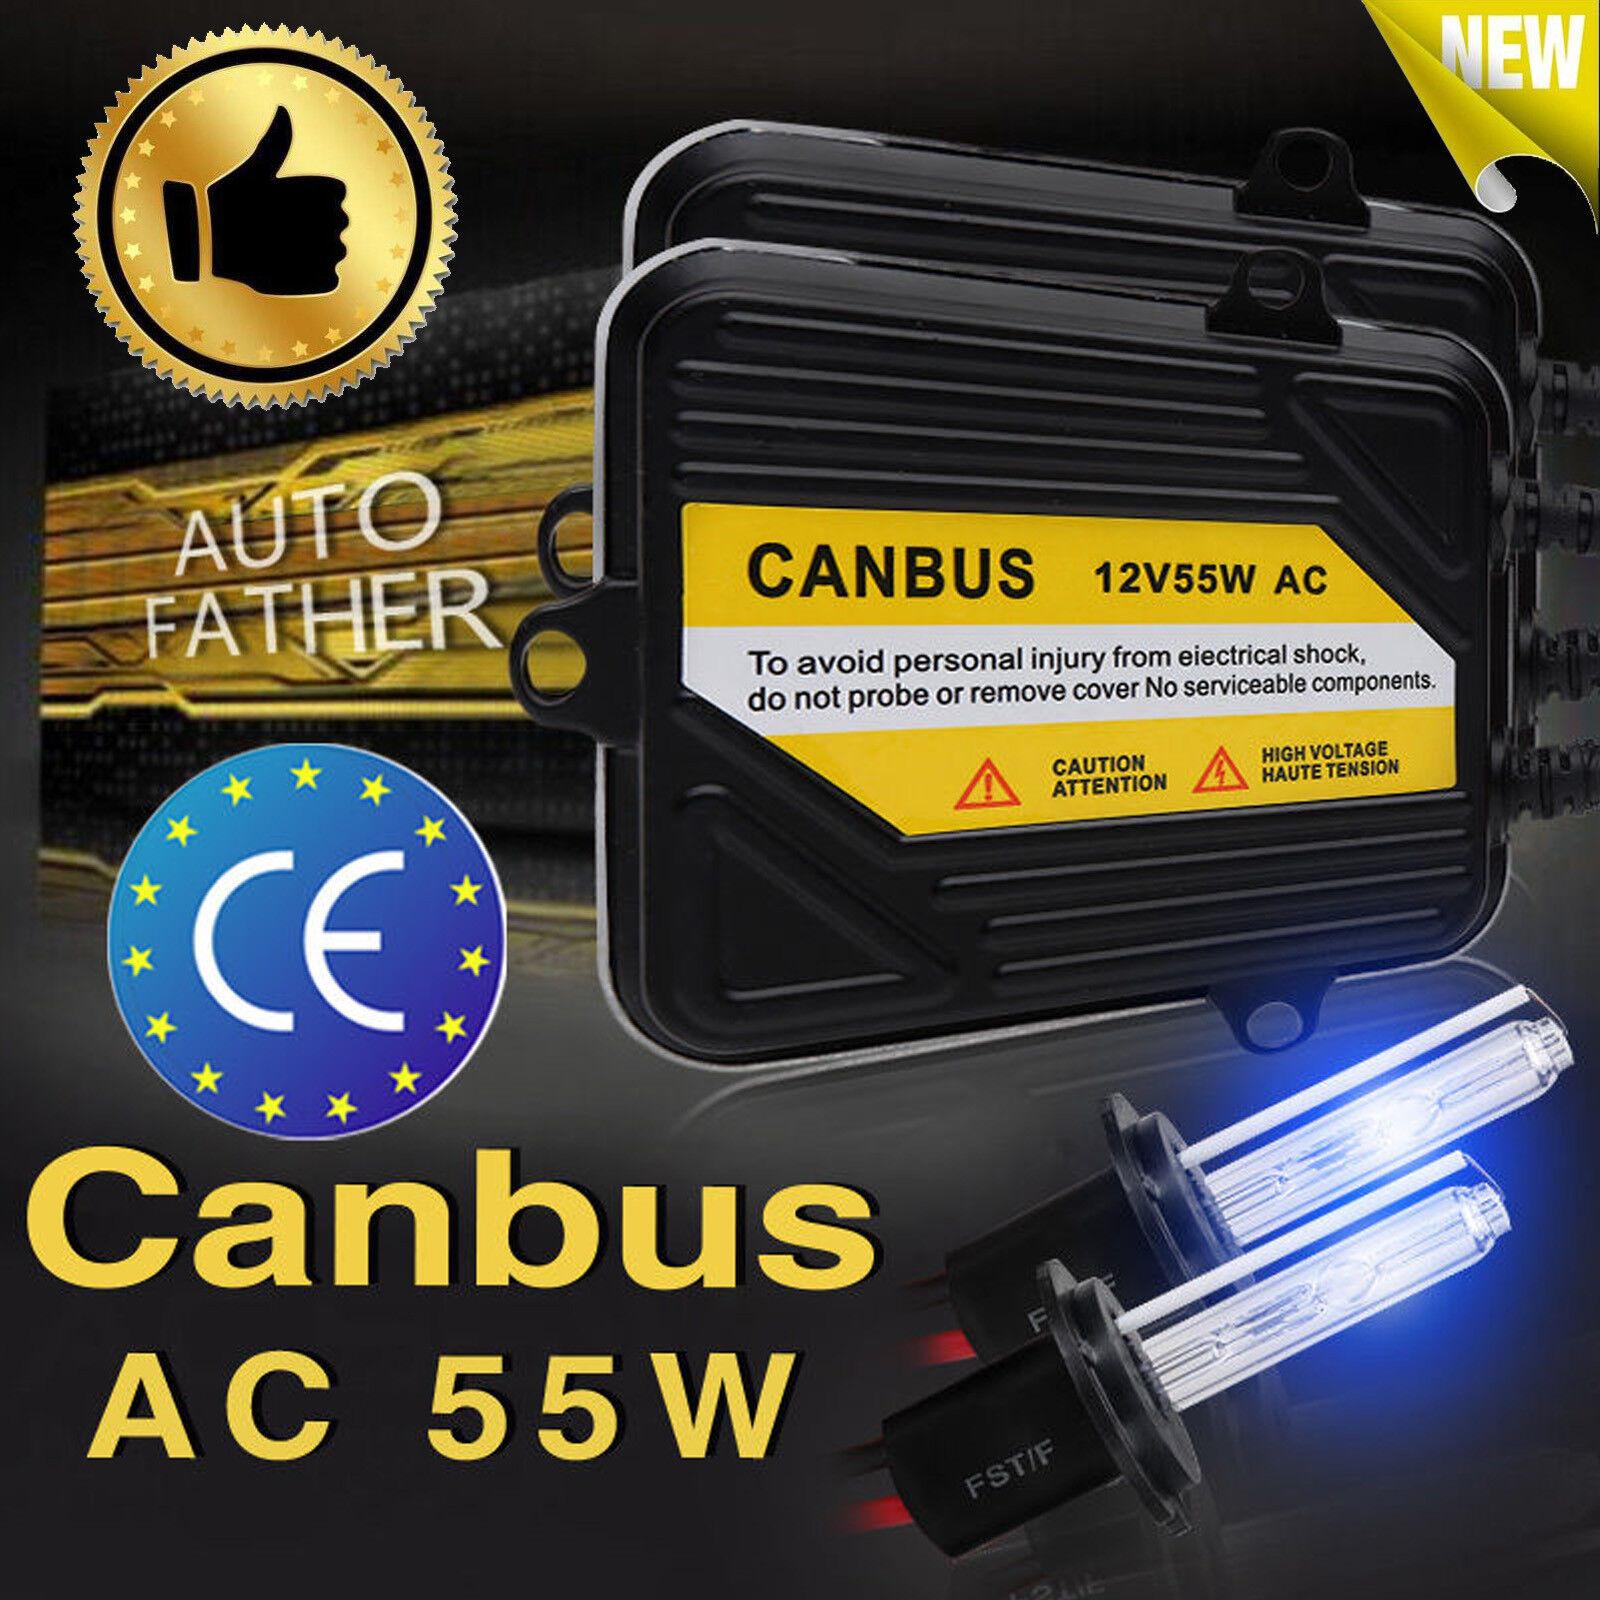 2xAC 55W CANBUS ERROR FREE HID SLIM Ballast Headlight H4 H1 H3 H7 H11 9005 9006